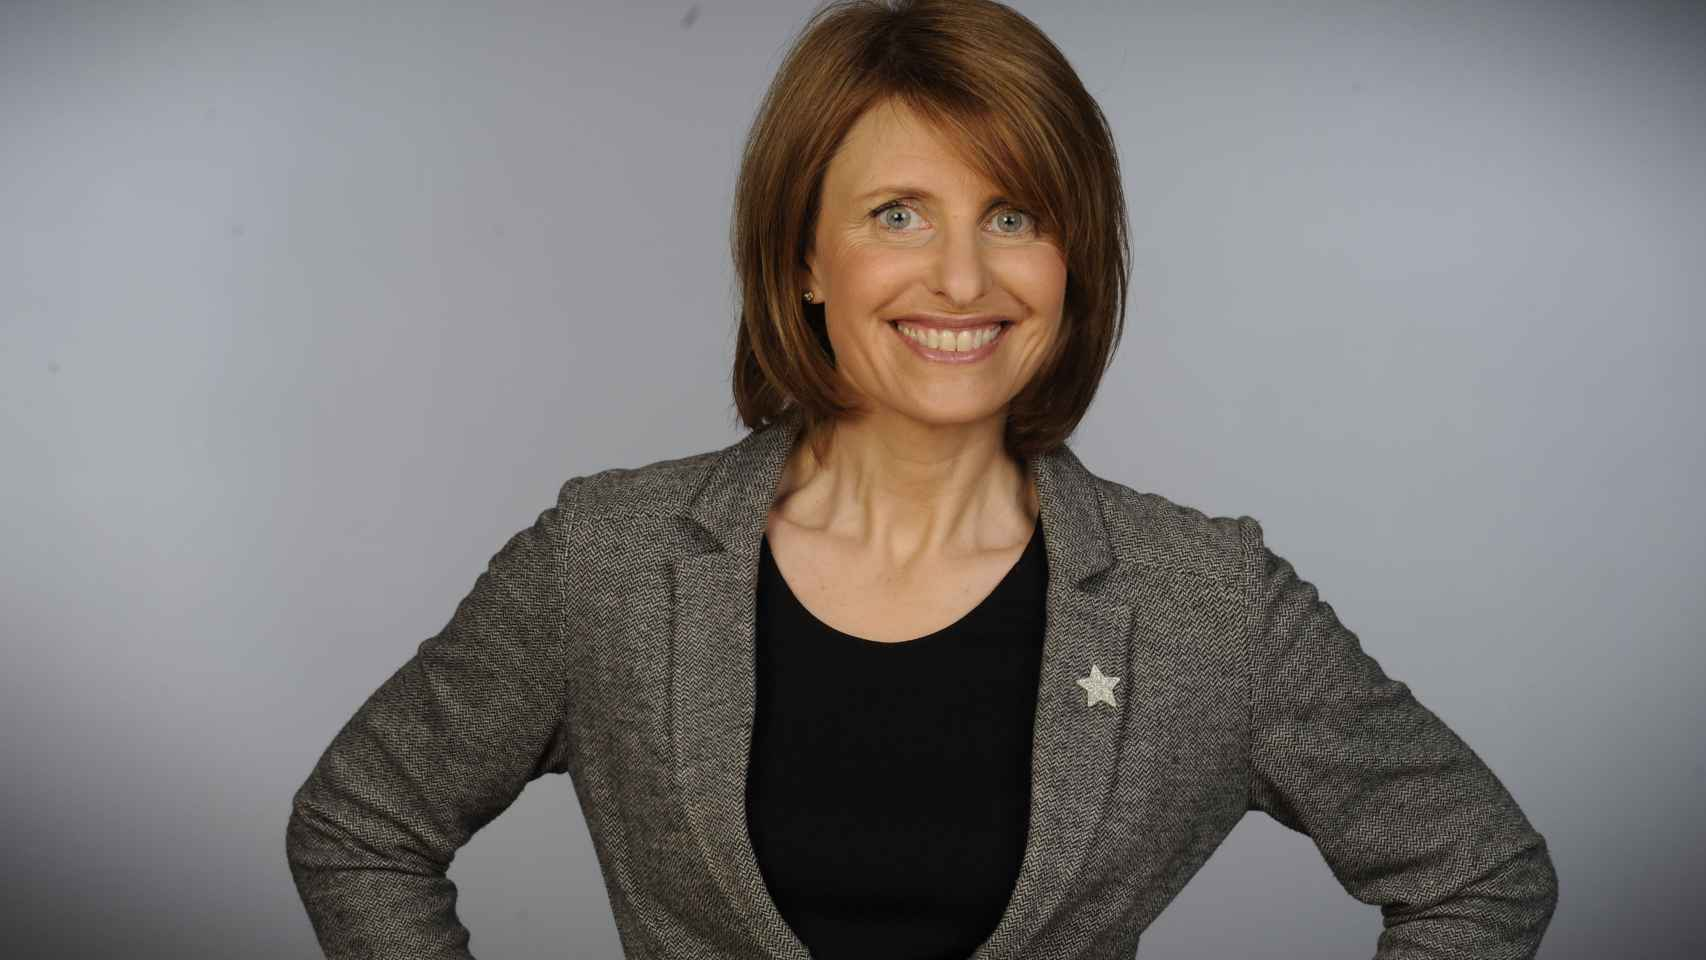 Valérie Poinsot, en una imagen corporativa.